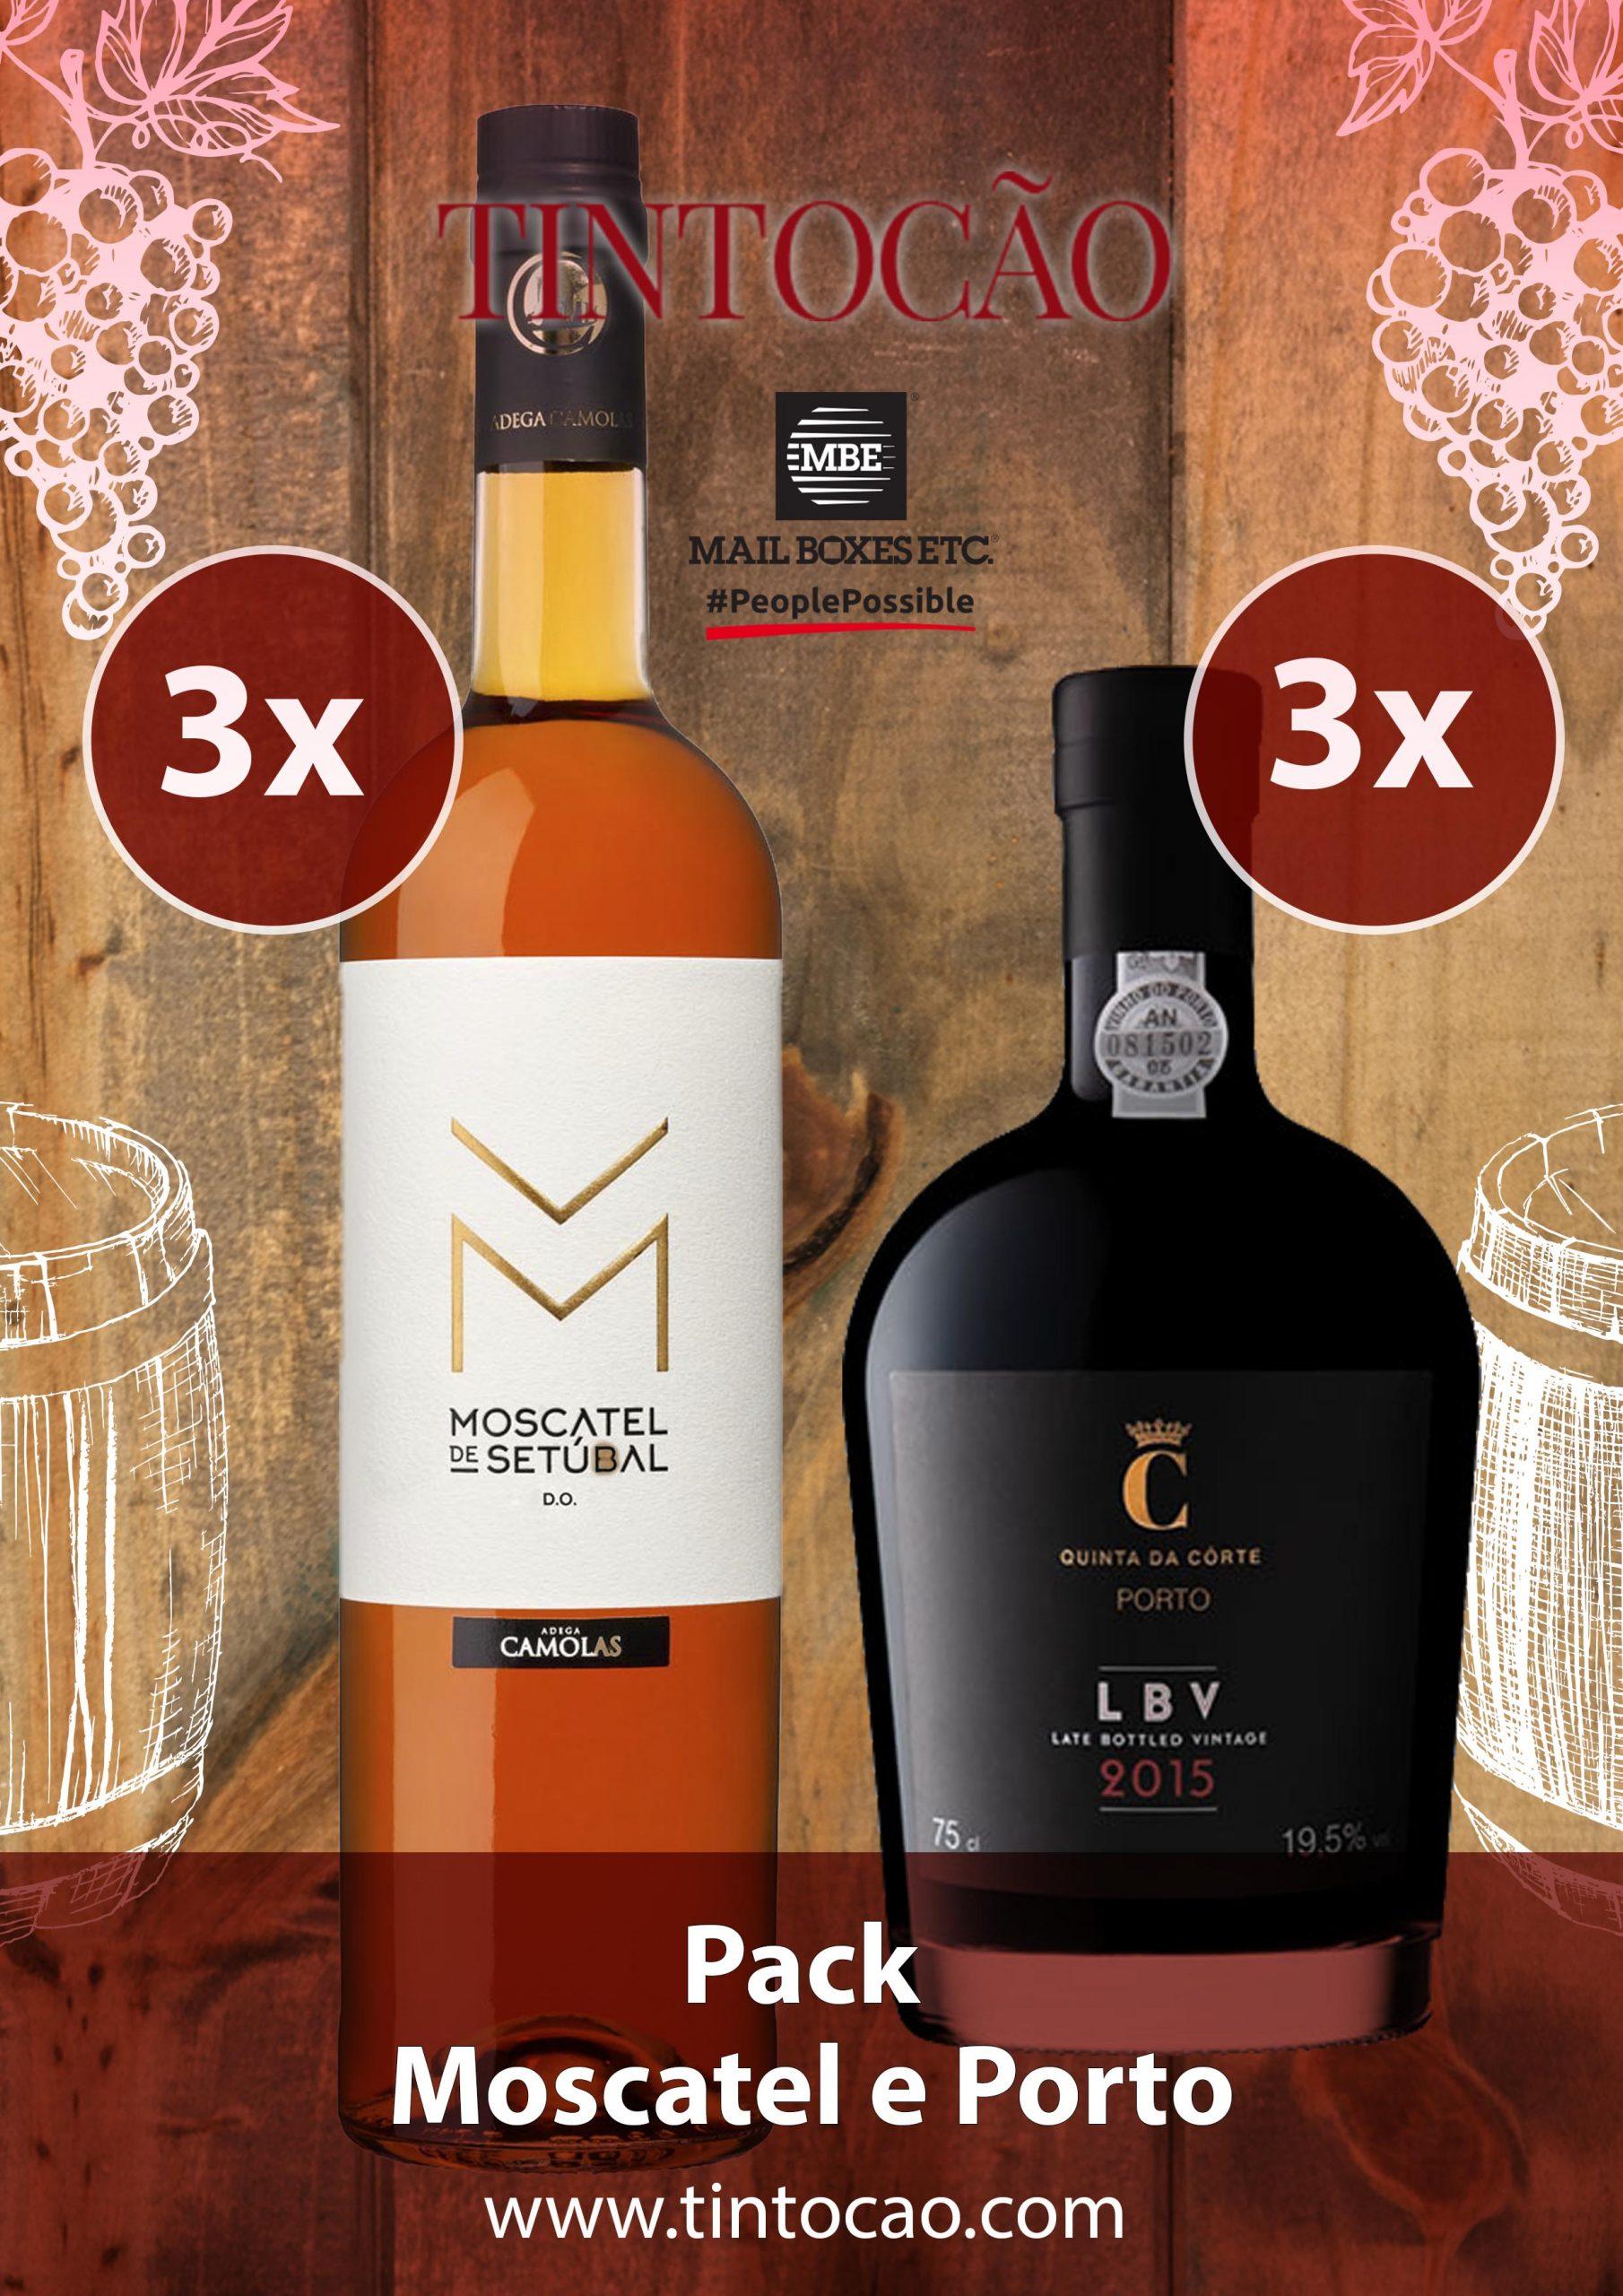 Moscatel e Porto